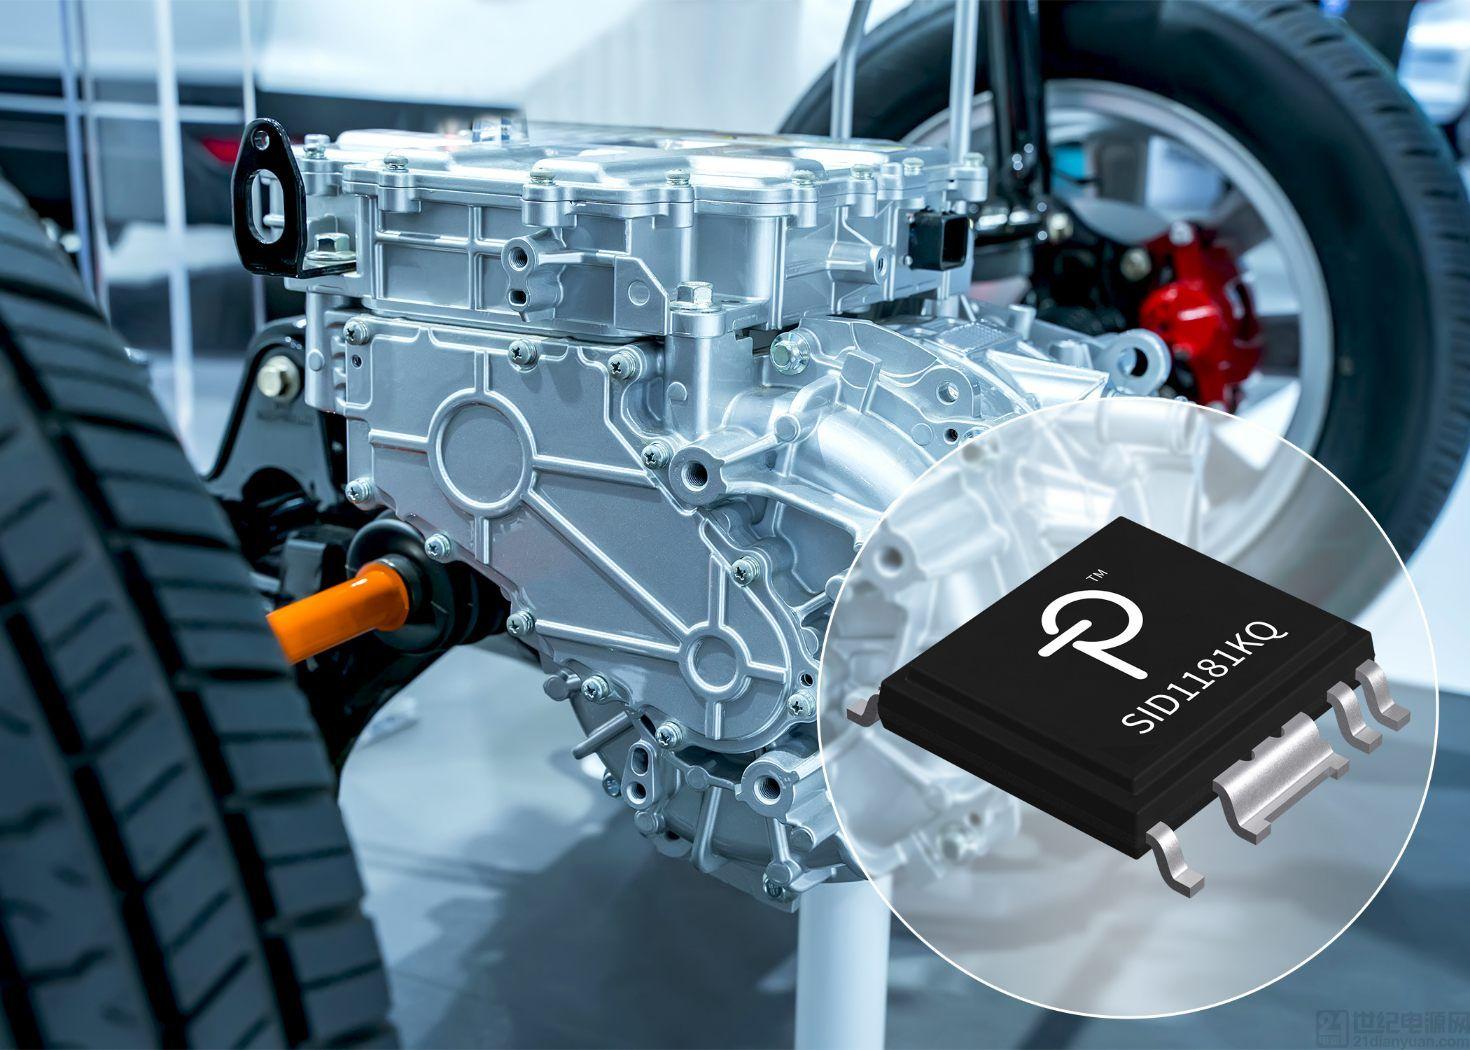 Power Integrations 推出的高可靠性 SCALE-iDriver 门极驱动器已通过